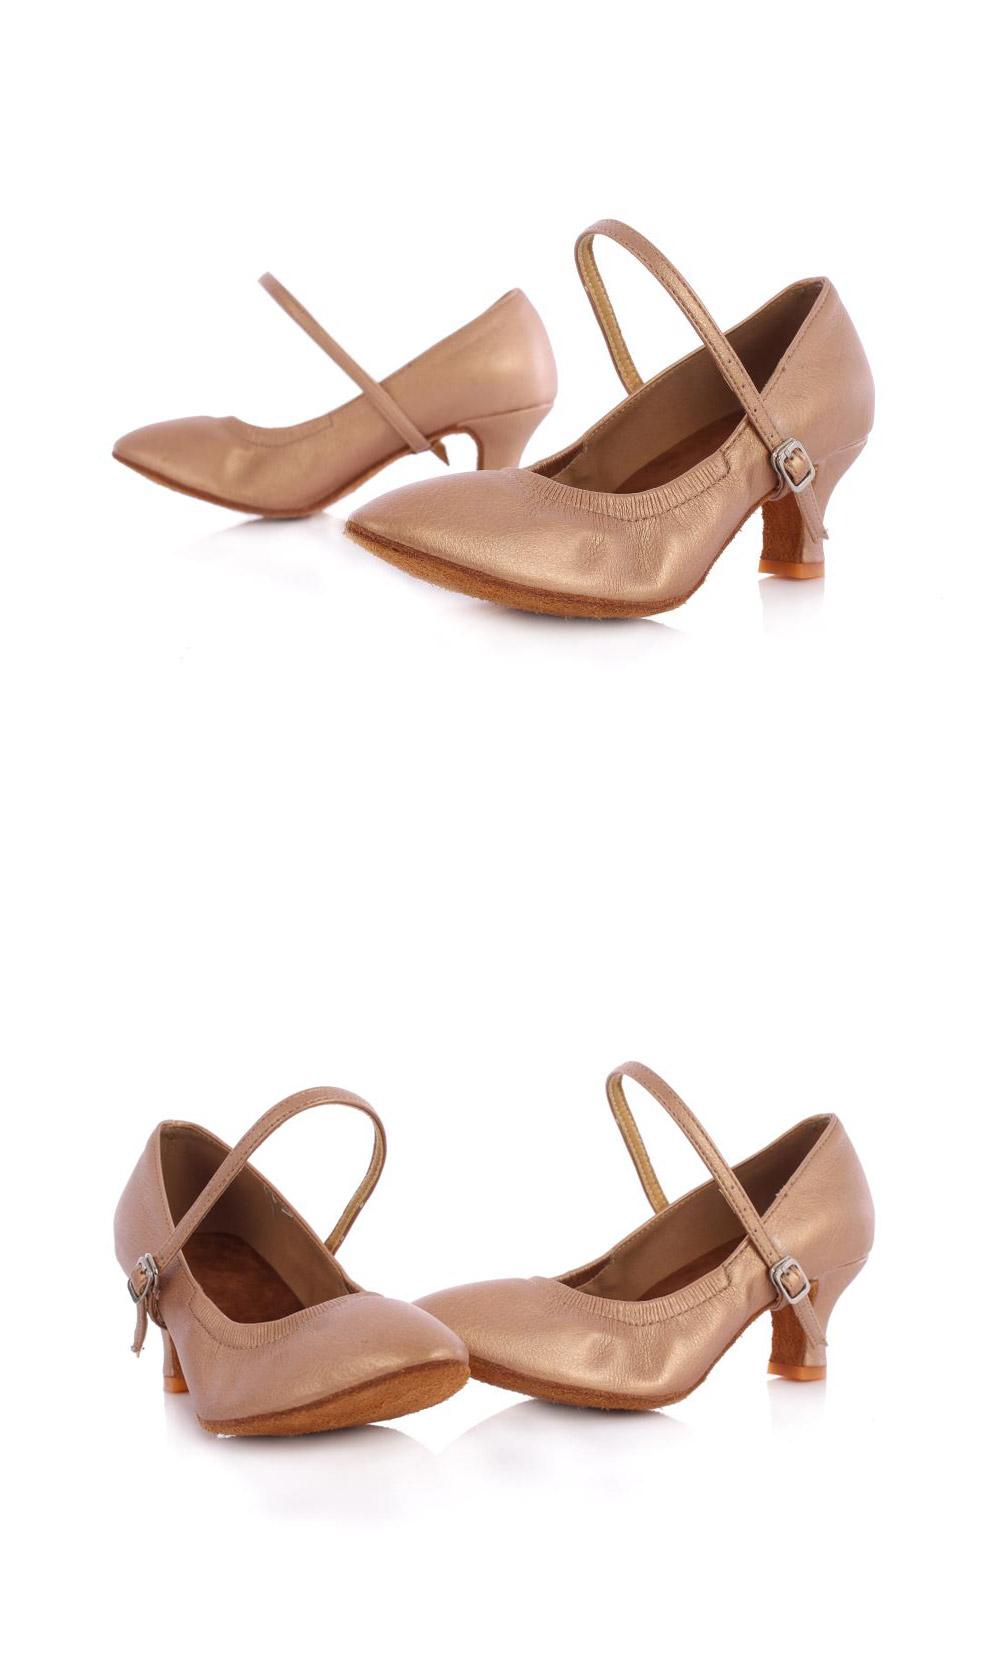 Hot Selling Latin Dancing Shoes For Women Soft Bottom Tango Shoes 57Cm Modern Salsa Dance Shoes Female Ballroom Dancing Shoes (12)